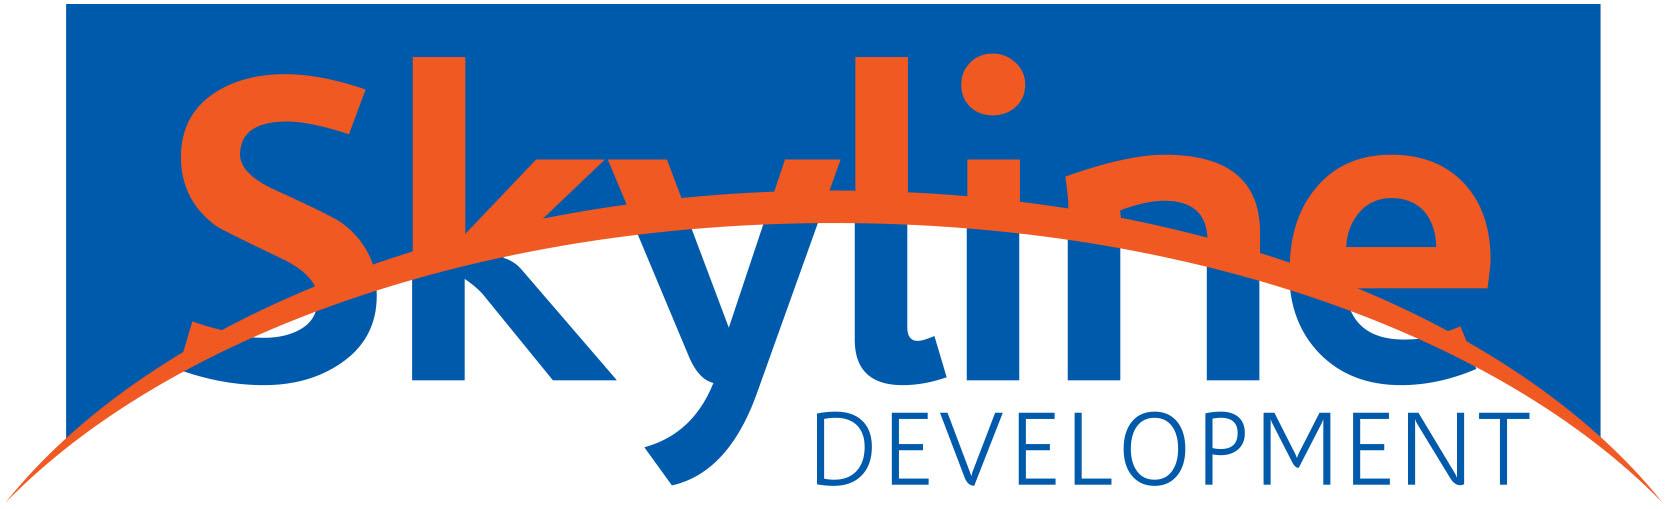 skylline development logo